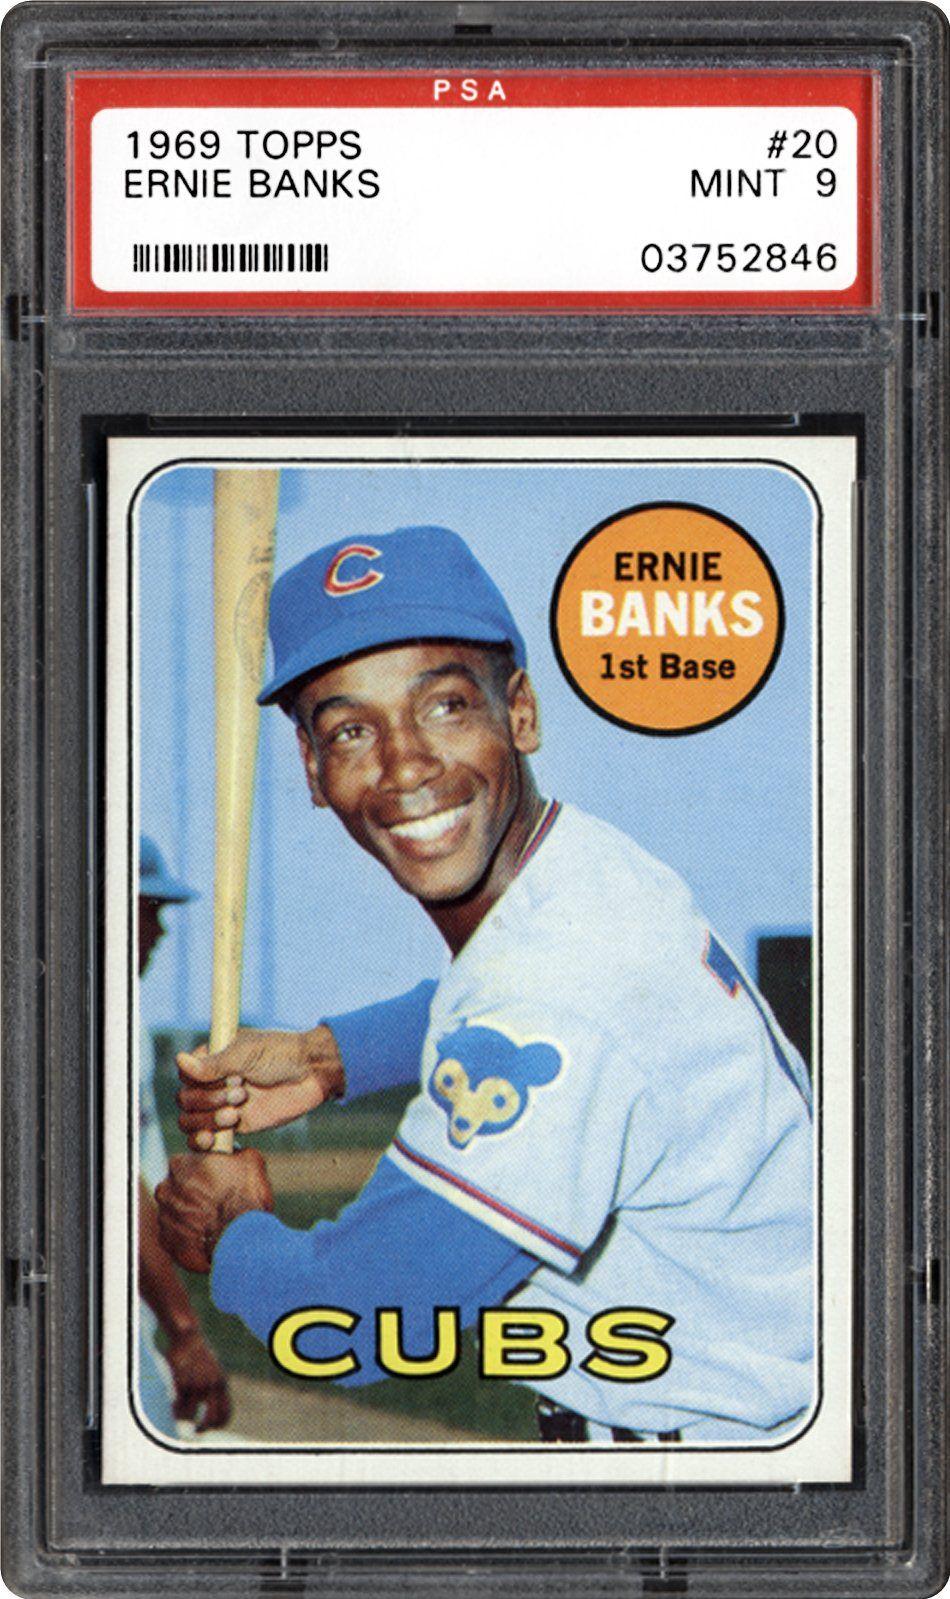 1969 topps ernie banks ernie banks baseball cards cubs